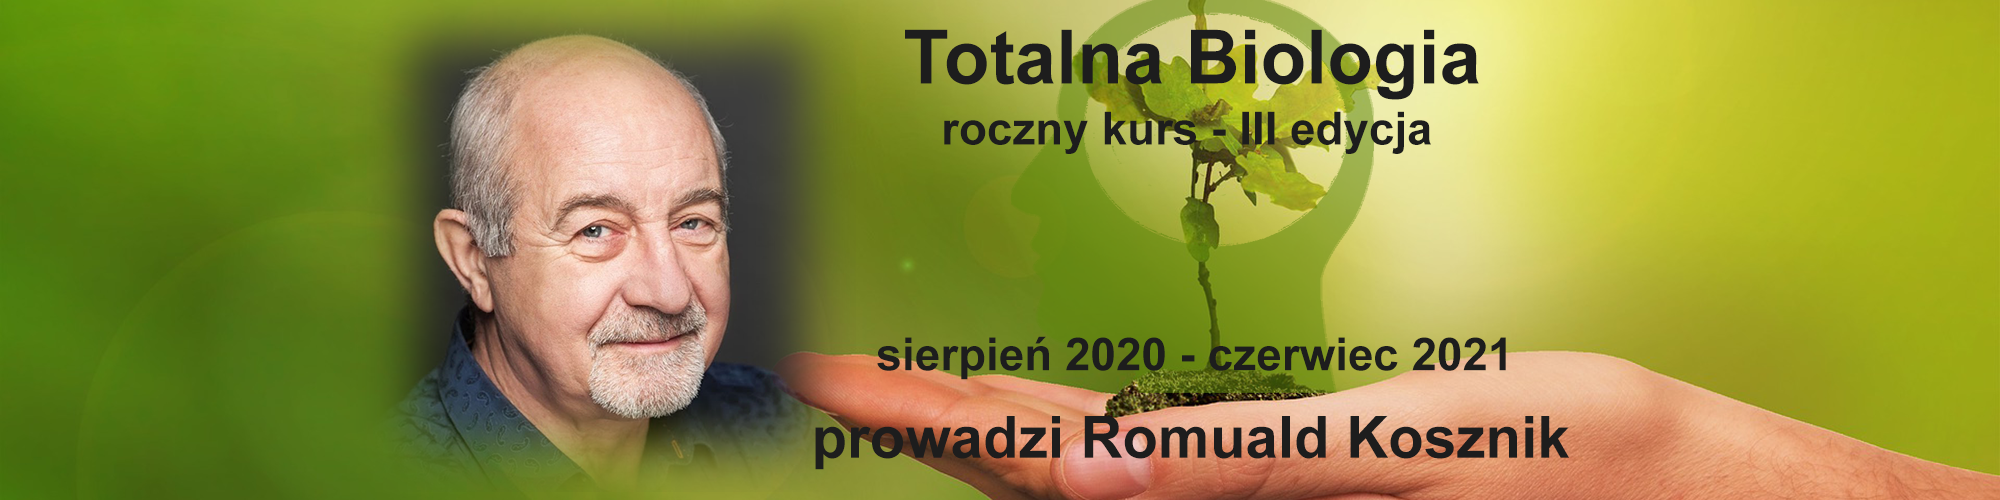 totalnabiologia6-banner